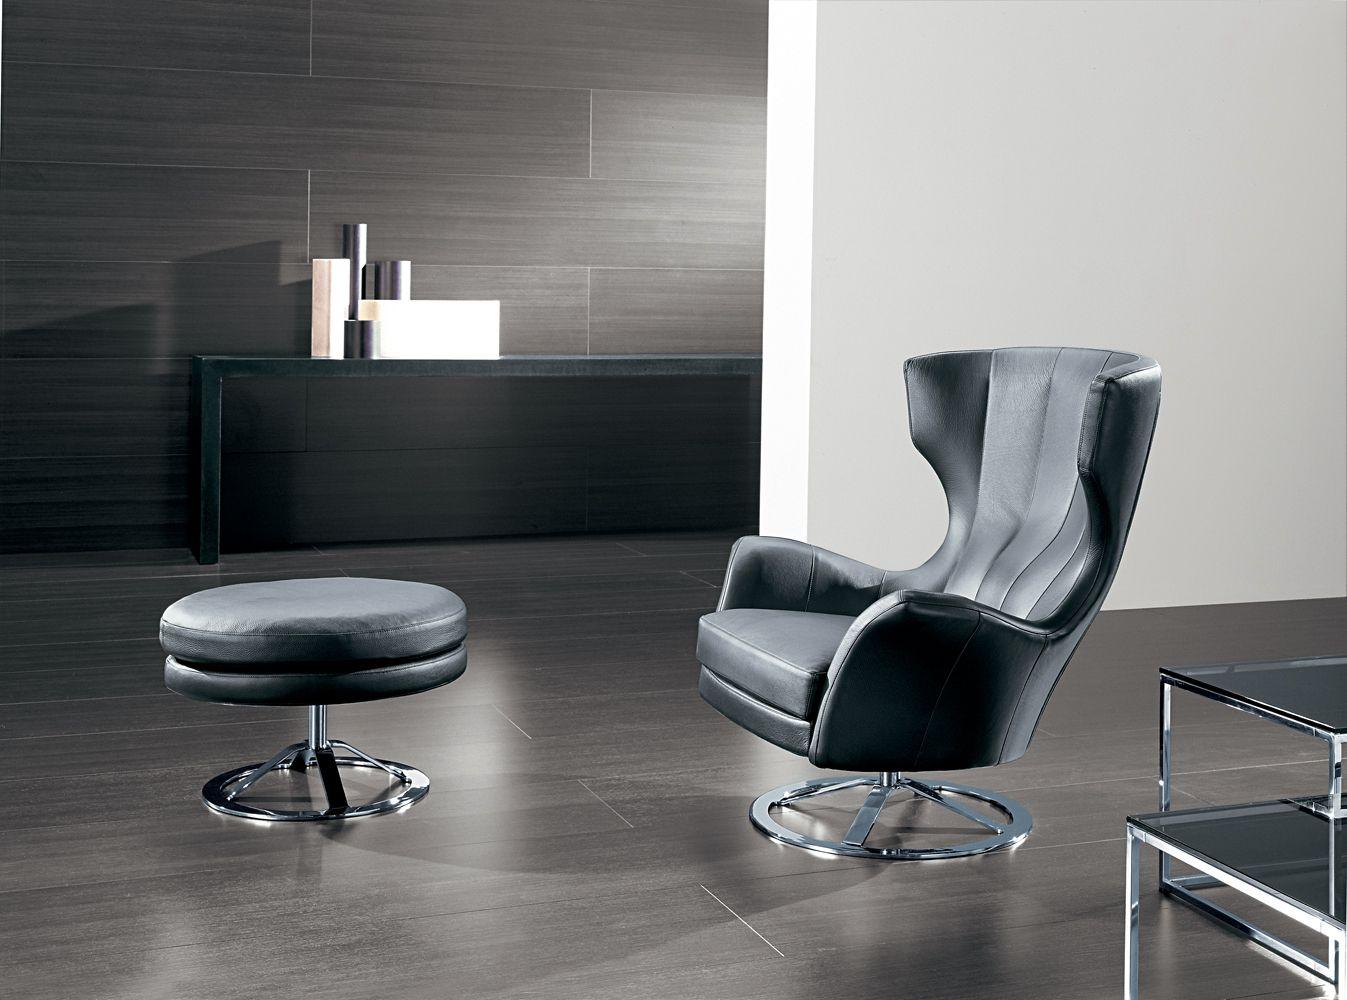 Jacko | CasaDesús - Barcelona · Inspire MeLeather ChairsLuxury  InteriorArmchairsBarcelonaAdoraHomeFurniture DesignRelaxer